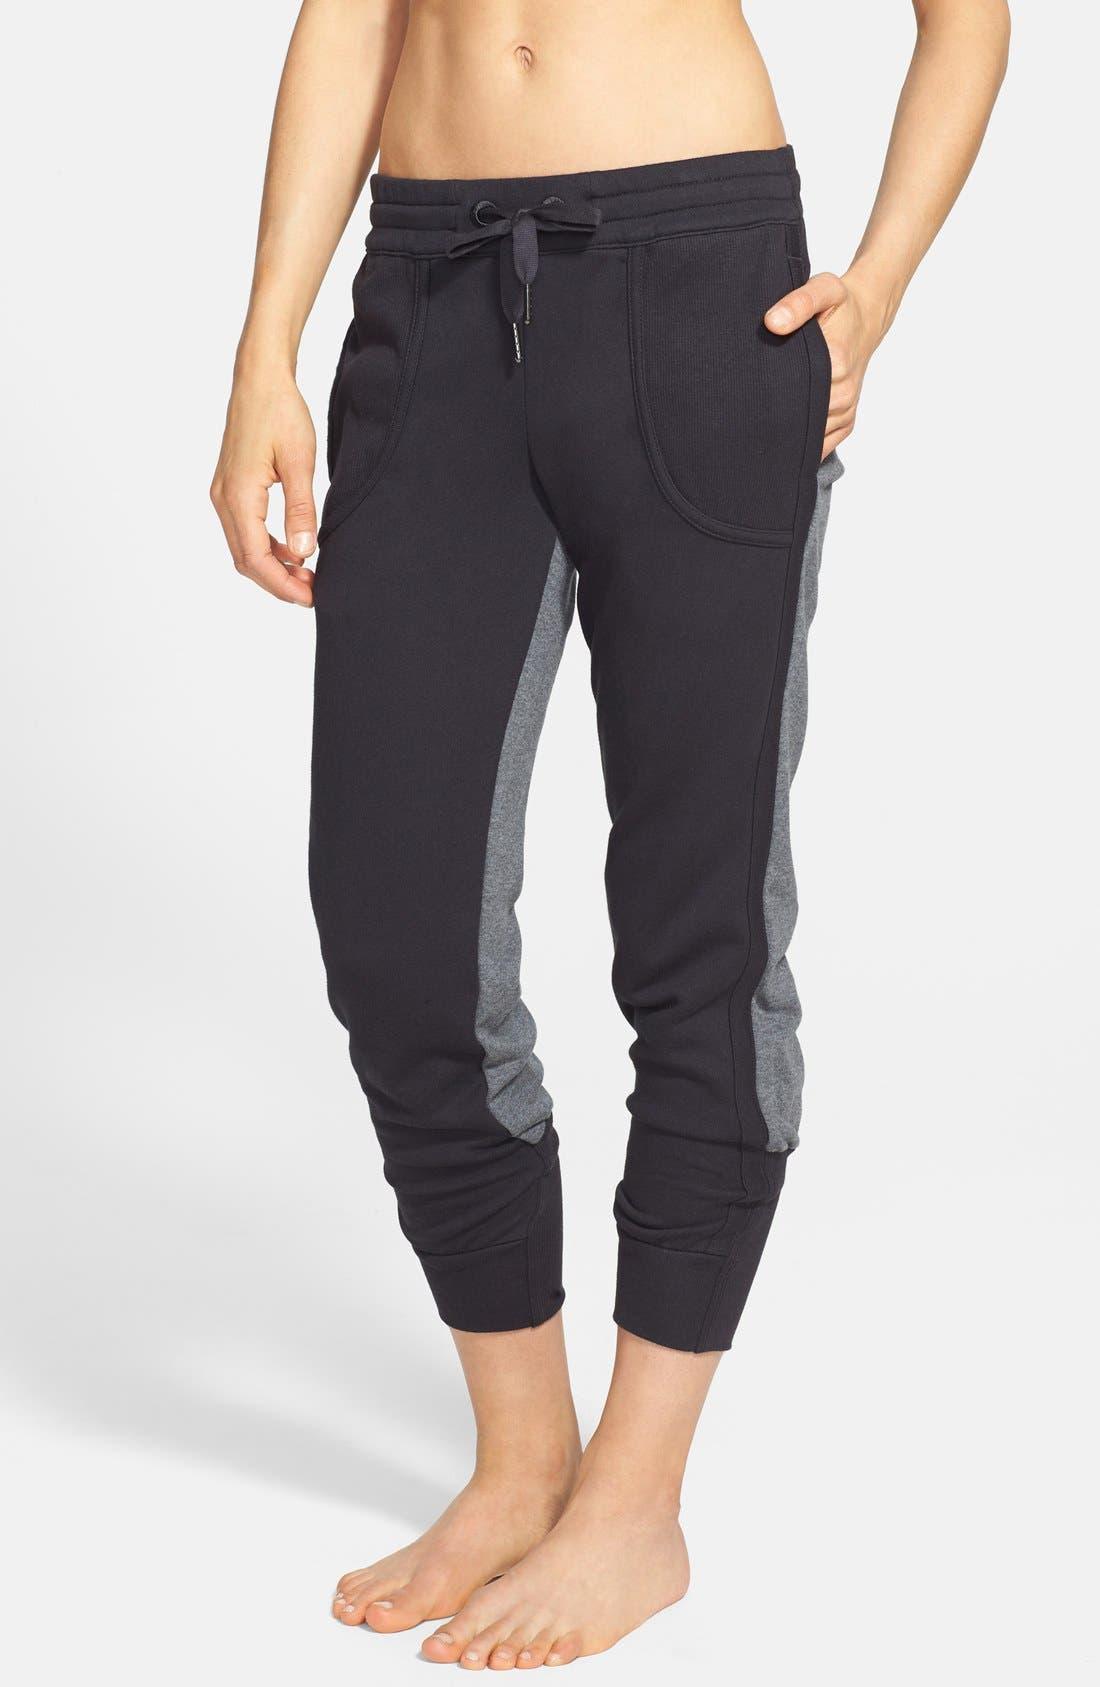 Alternate Image 1 Selected - adidas by Stella McCartney 'Essentials' Colorblock Sweatpants